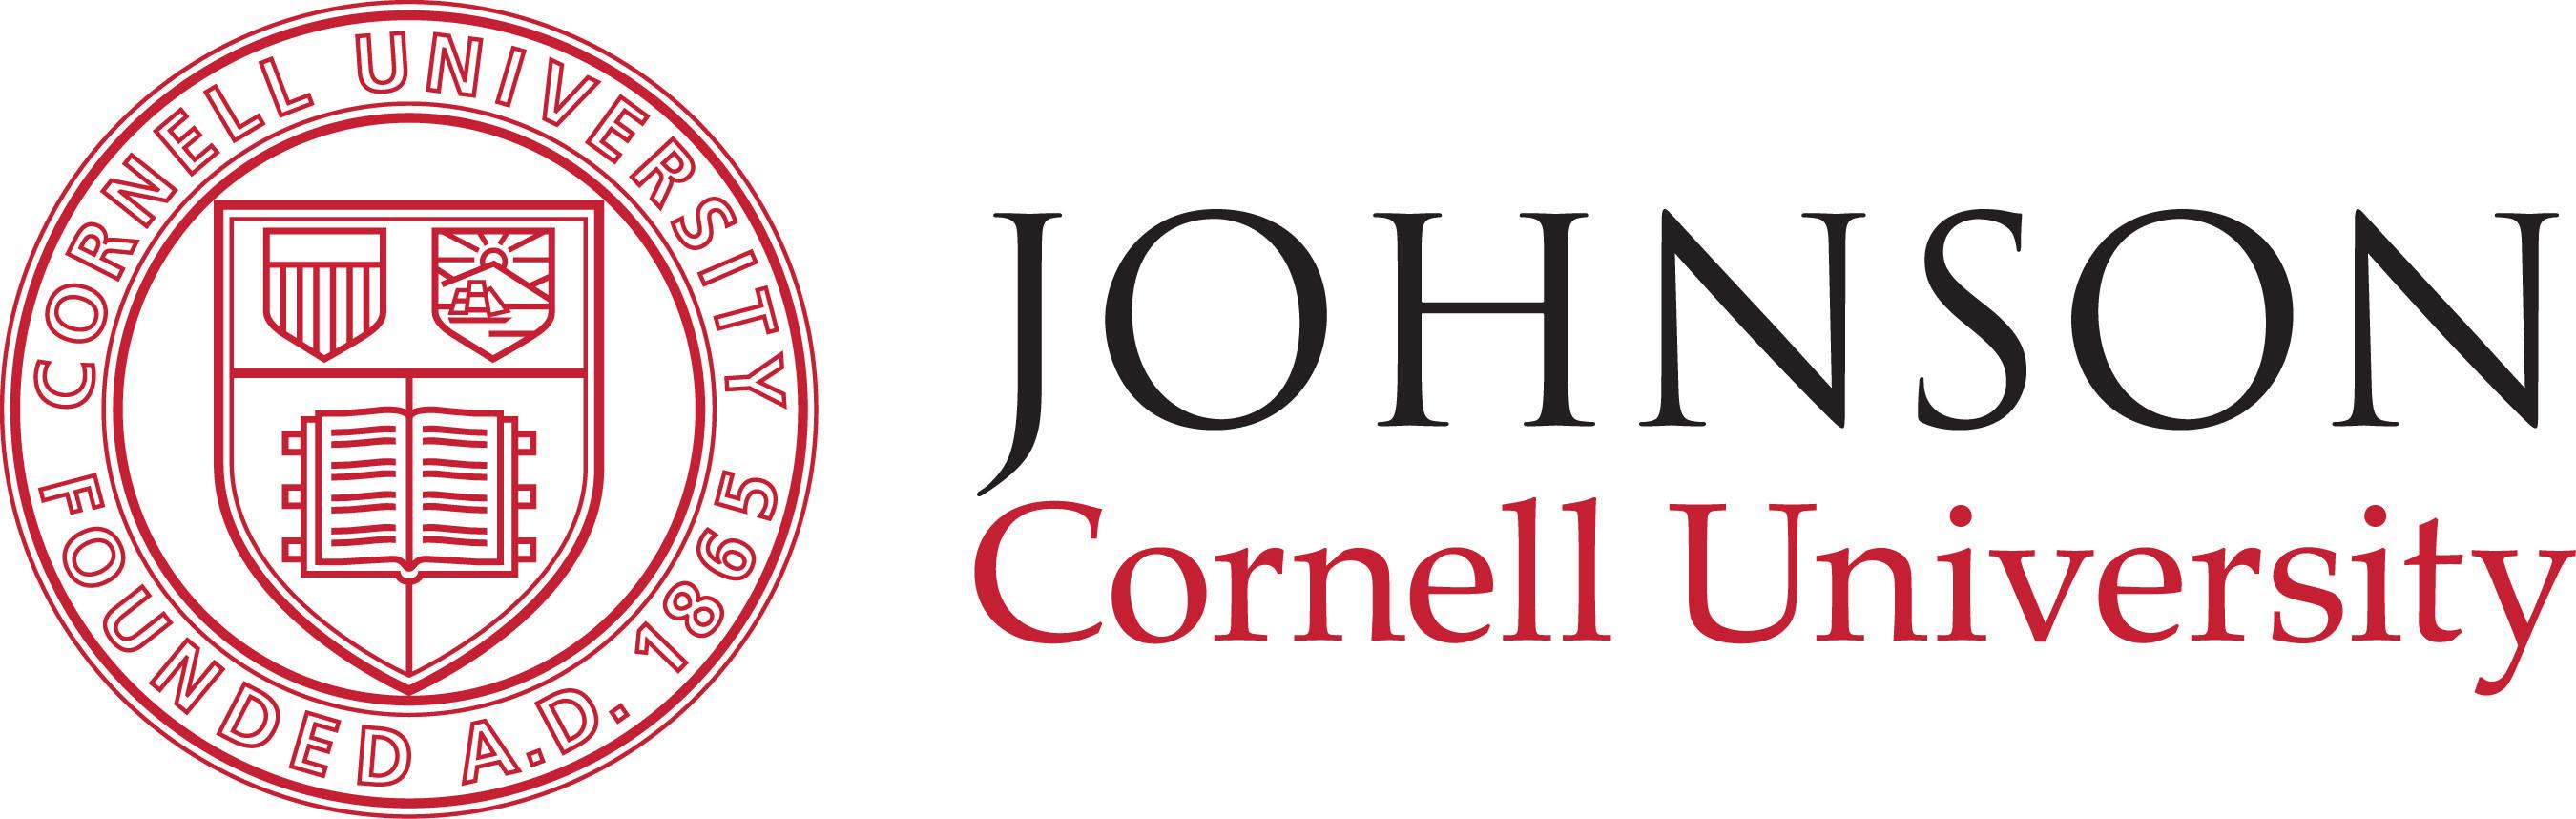 Johnson School at Cornell University logo.